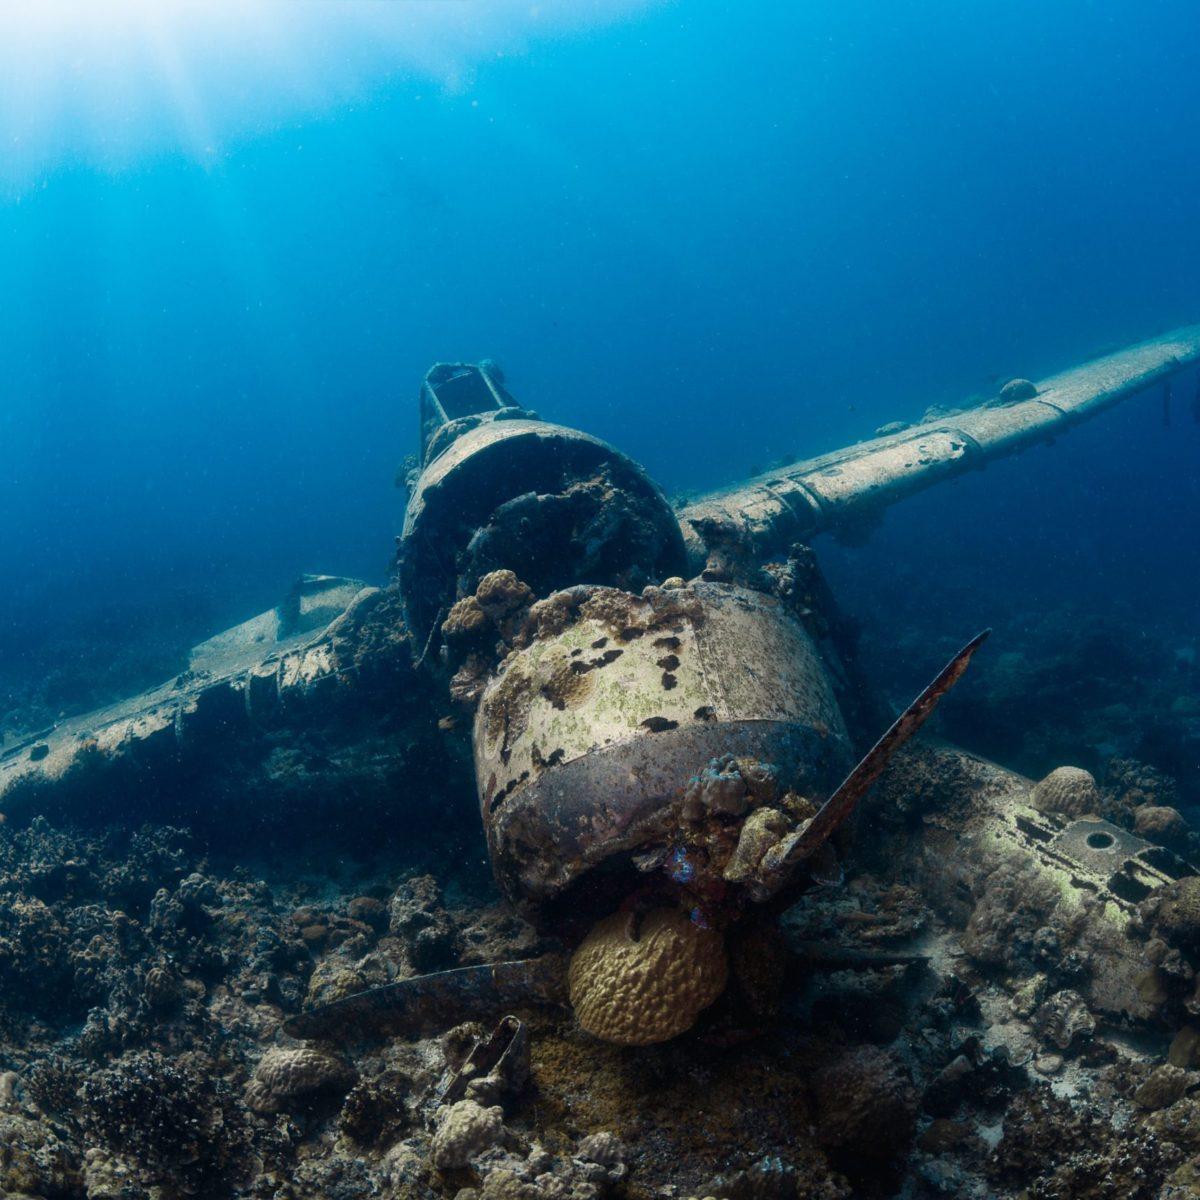 Micronesia - Beneath the Waves